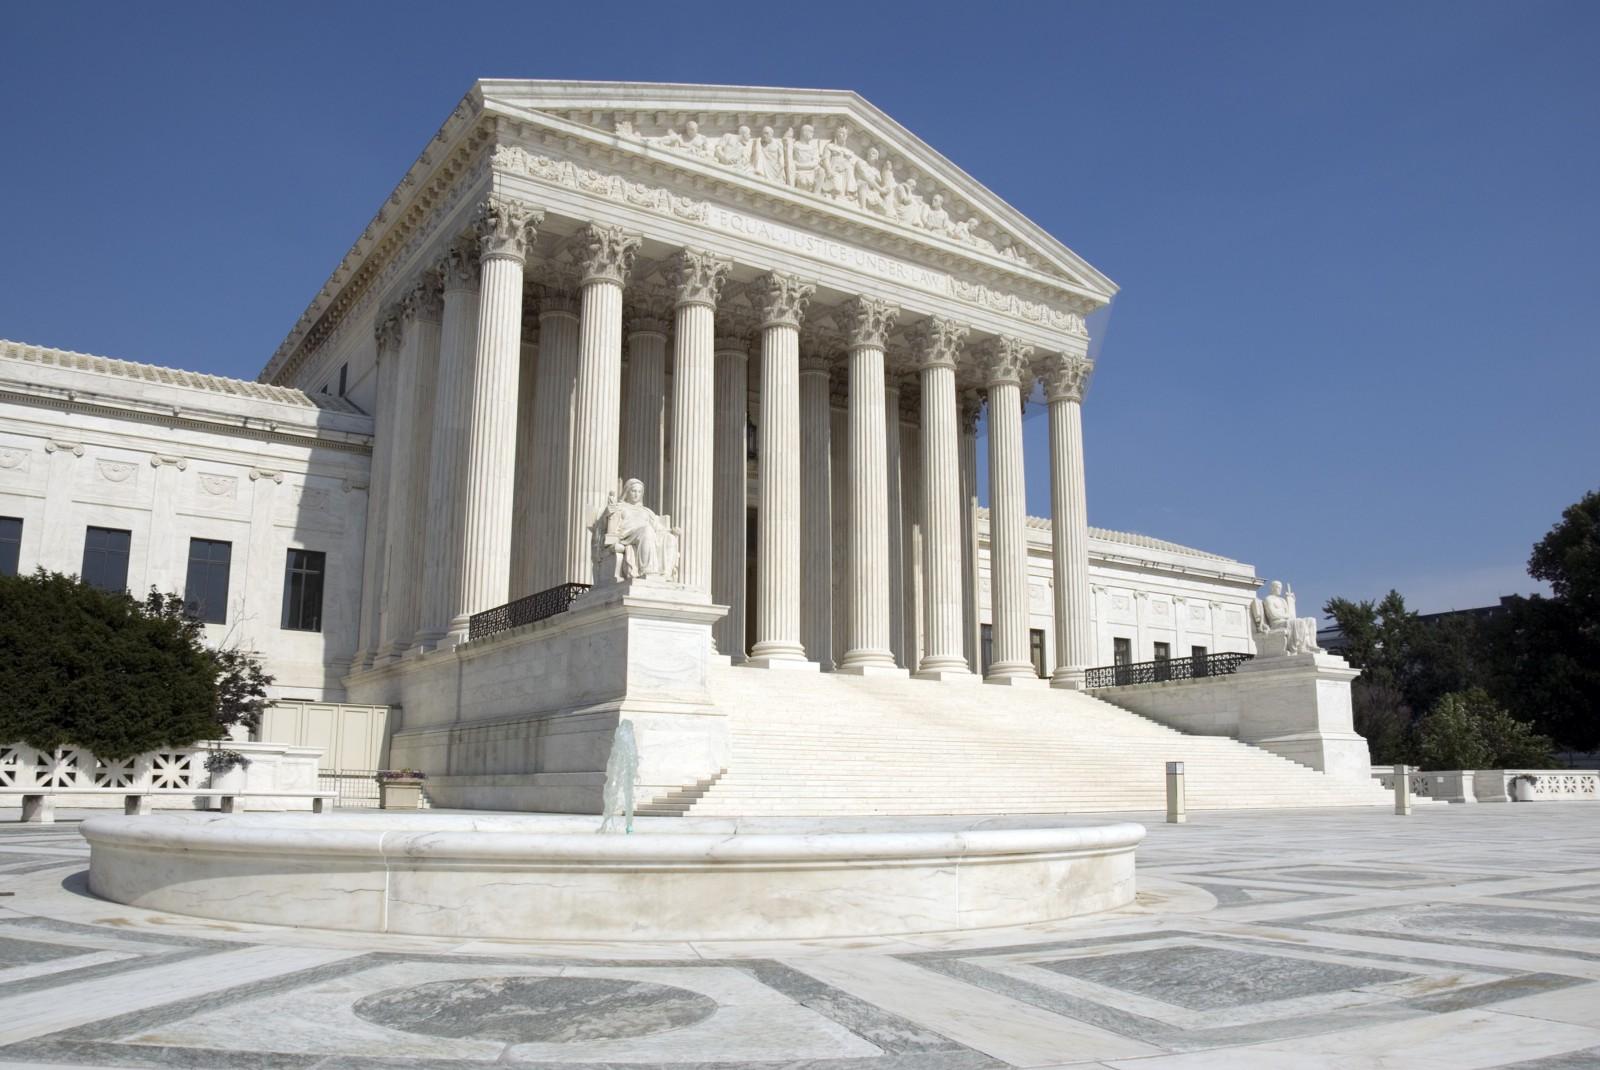 The Masterpiece Cakeshop Supreme Court Case